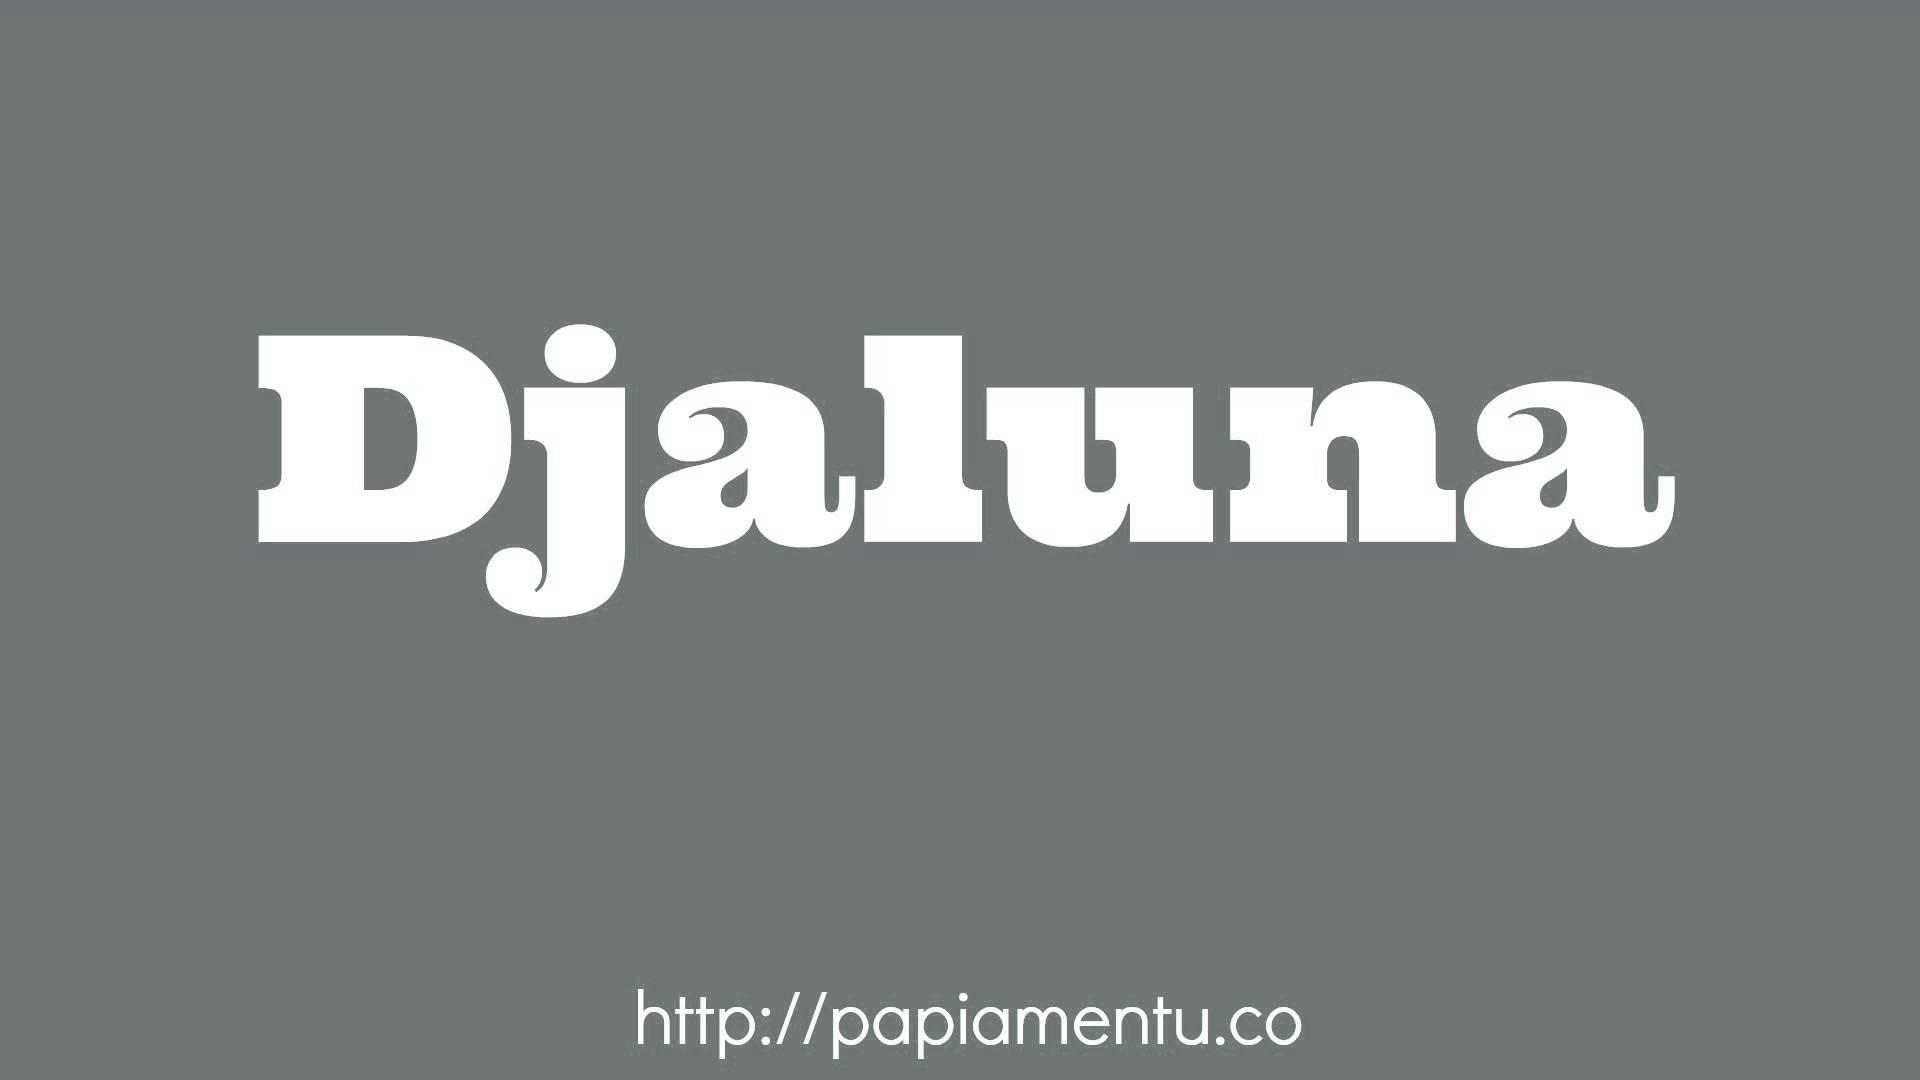 Zo Zeg Je Djaluna (Maandag) In Papiamentu